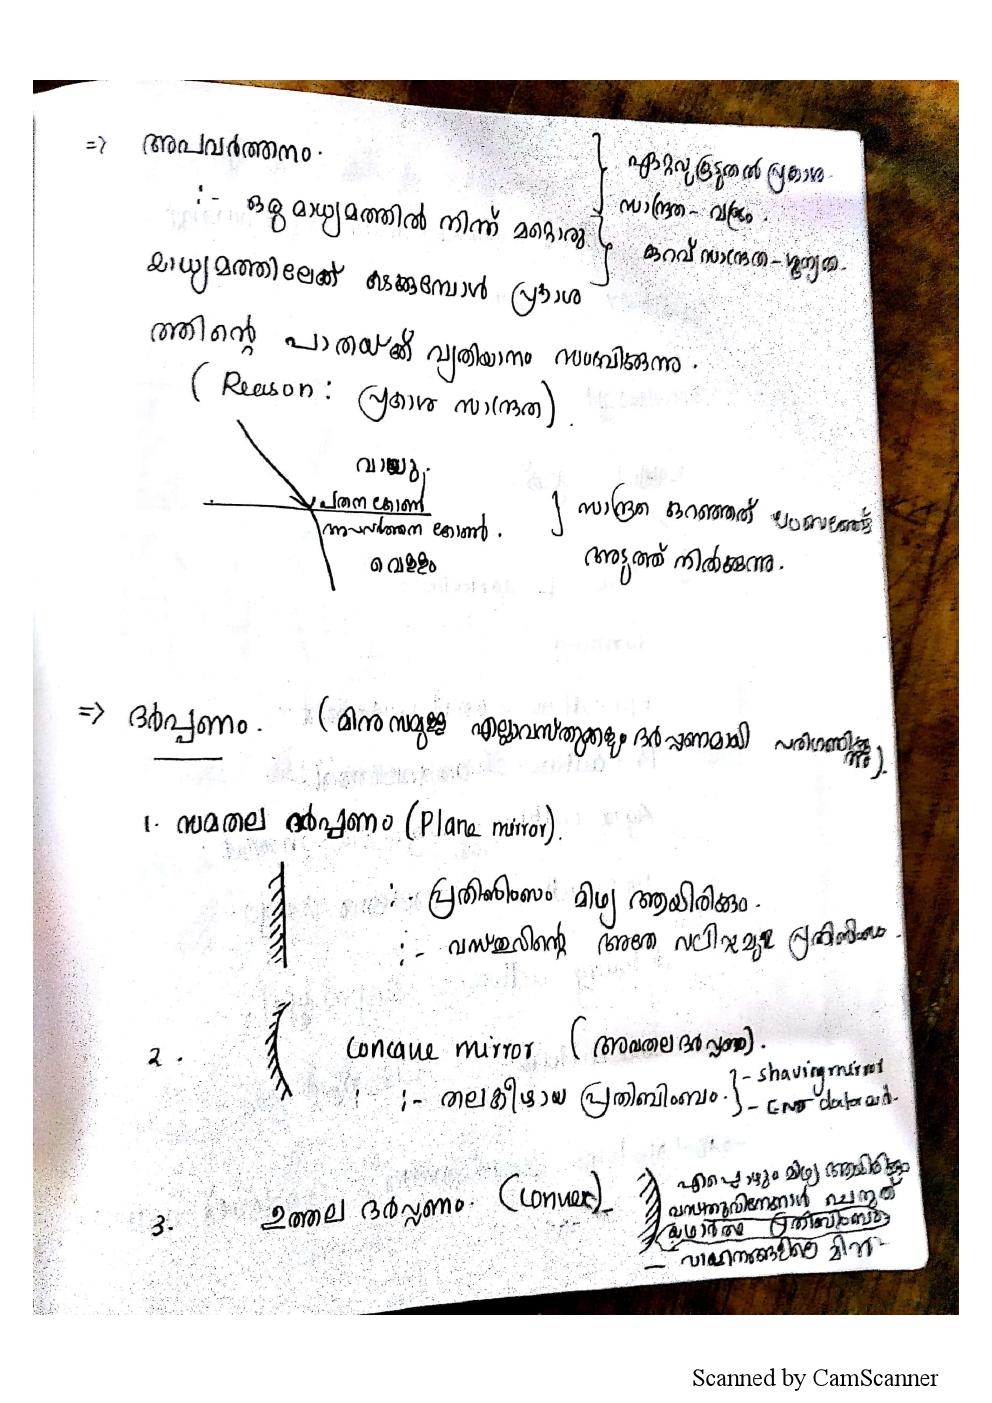 http://masterstudy.net/pdf/ktet_notes0034.png